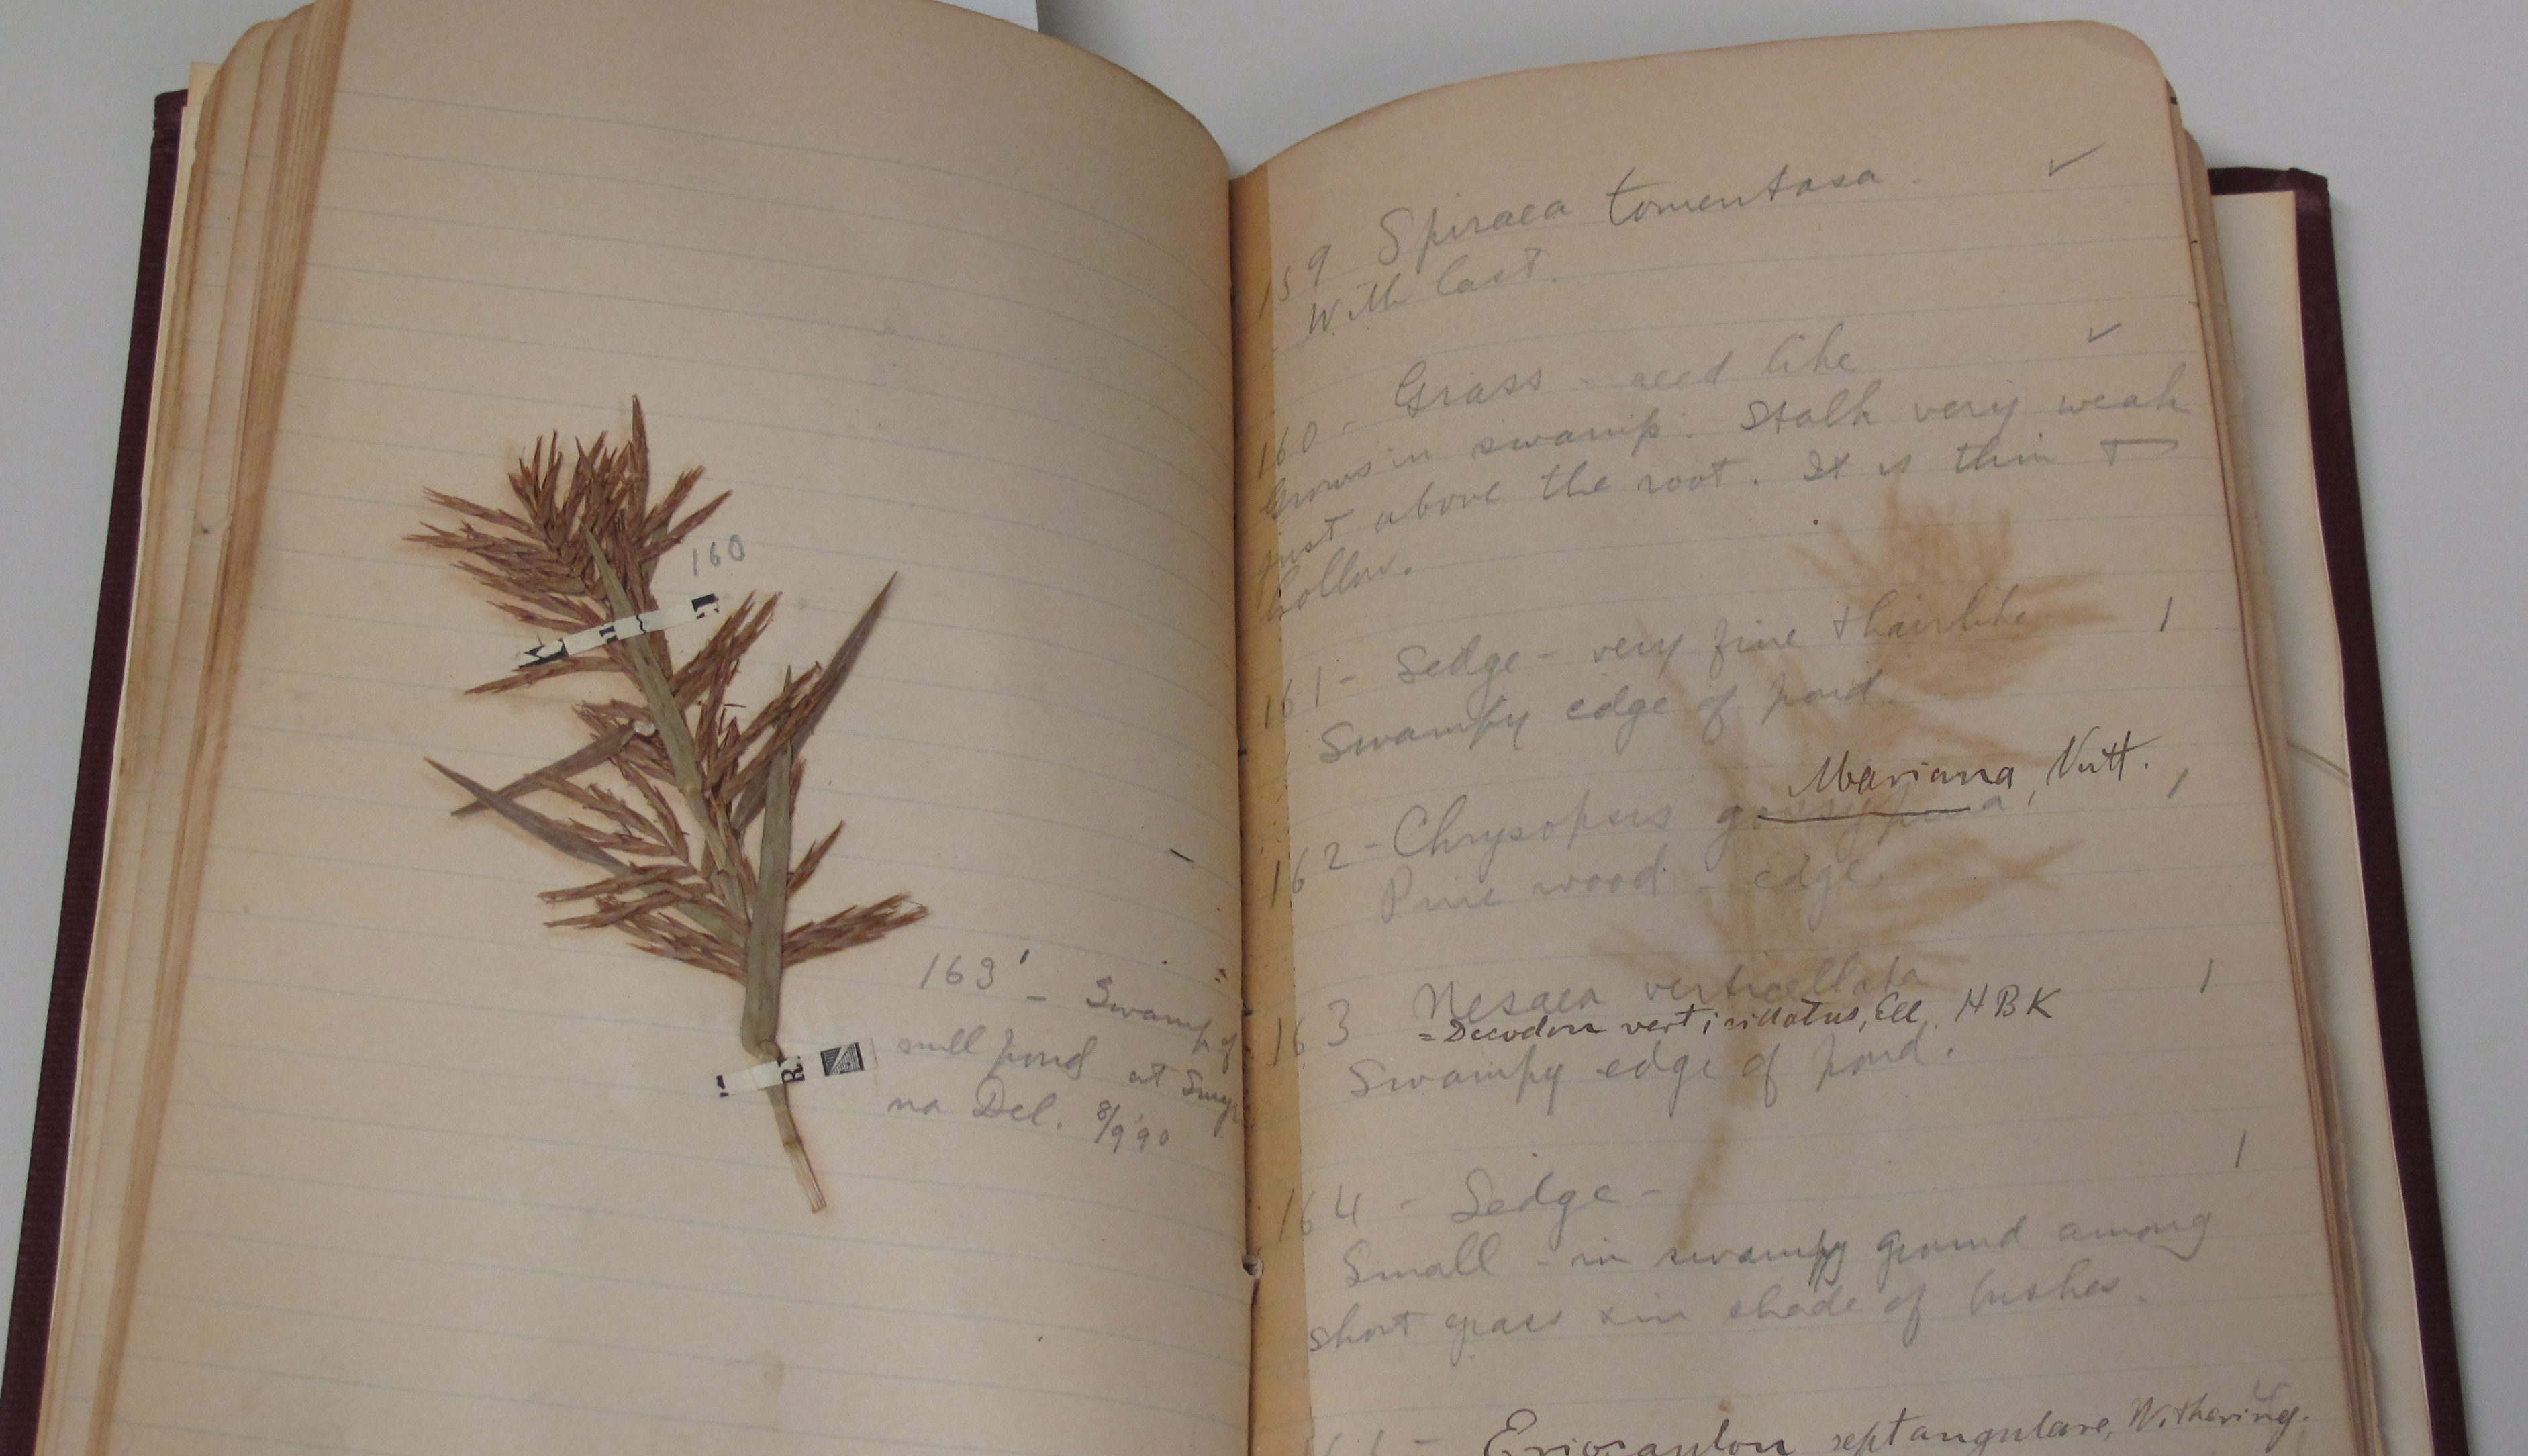 Botanical Specimen, Accession 12-130 - Jesse Herman Holmes Field Notes